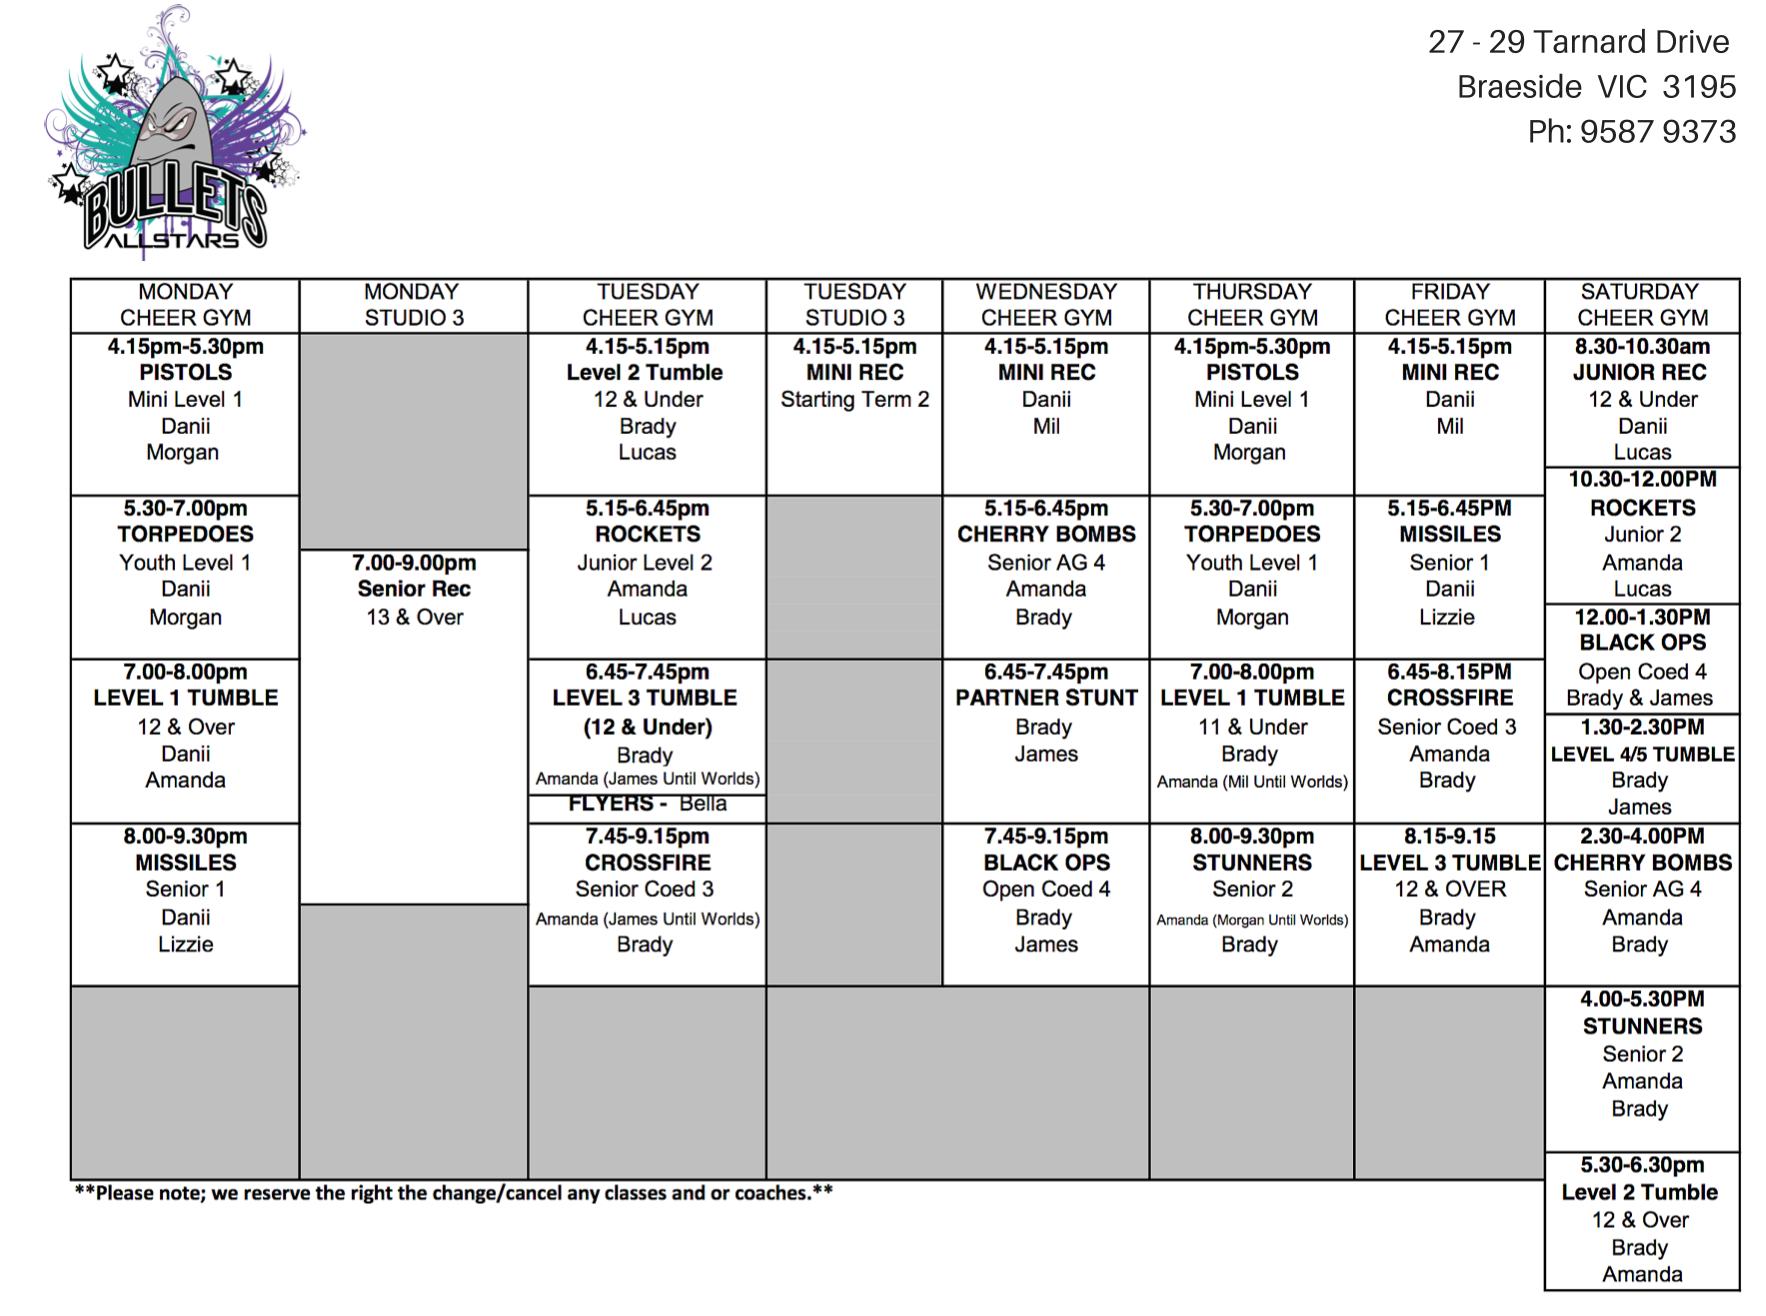 Bullets Allstars Cheerleading 2016 timetable